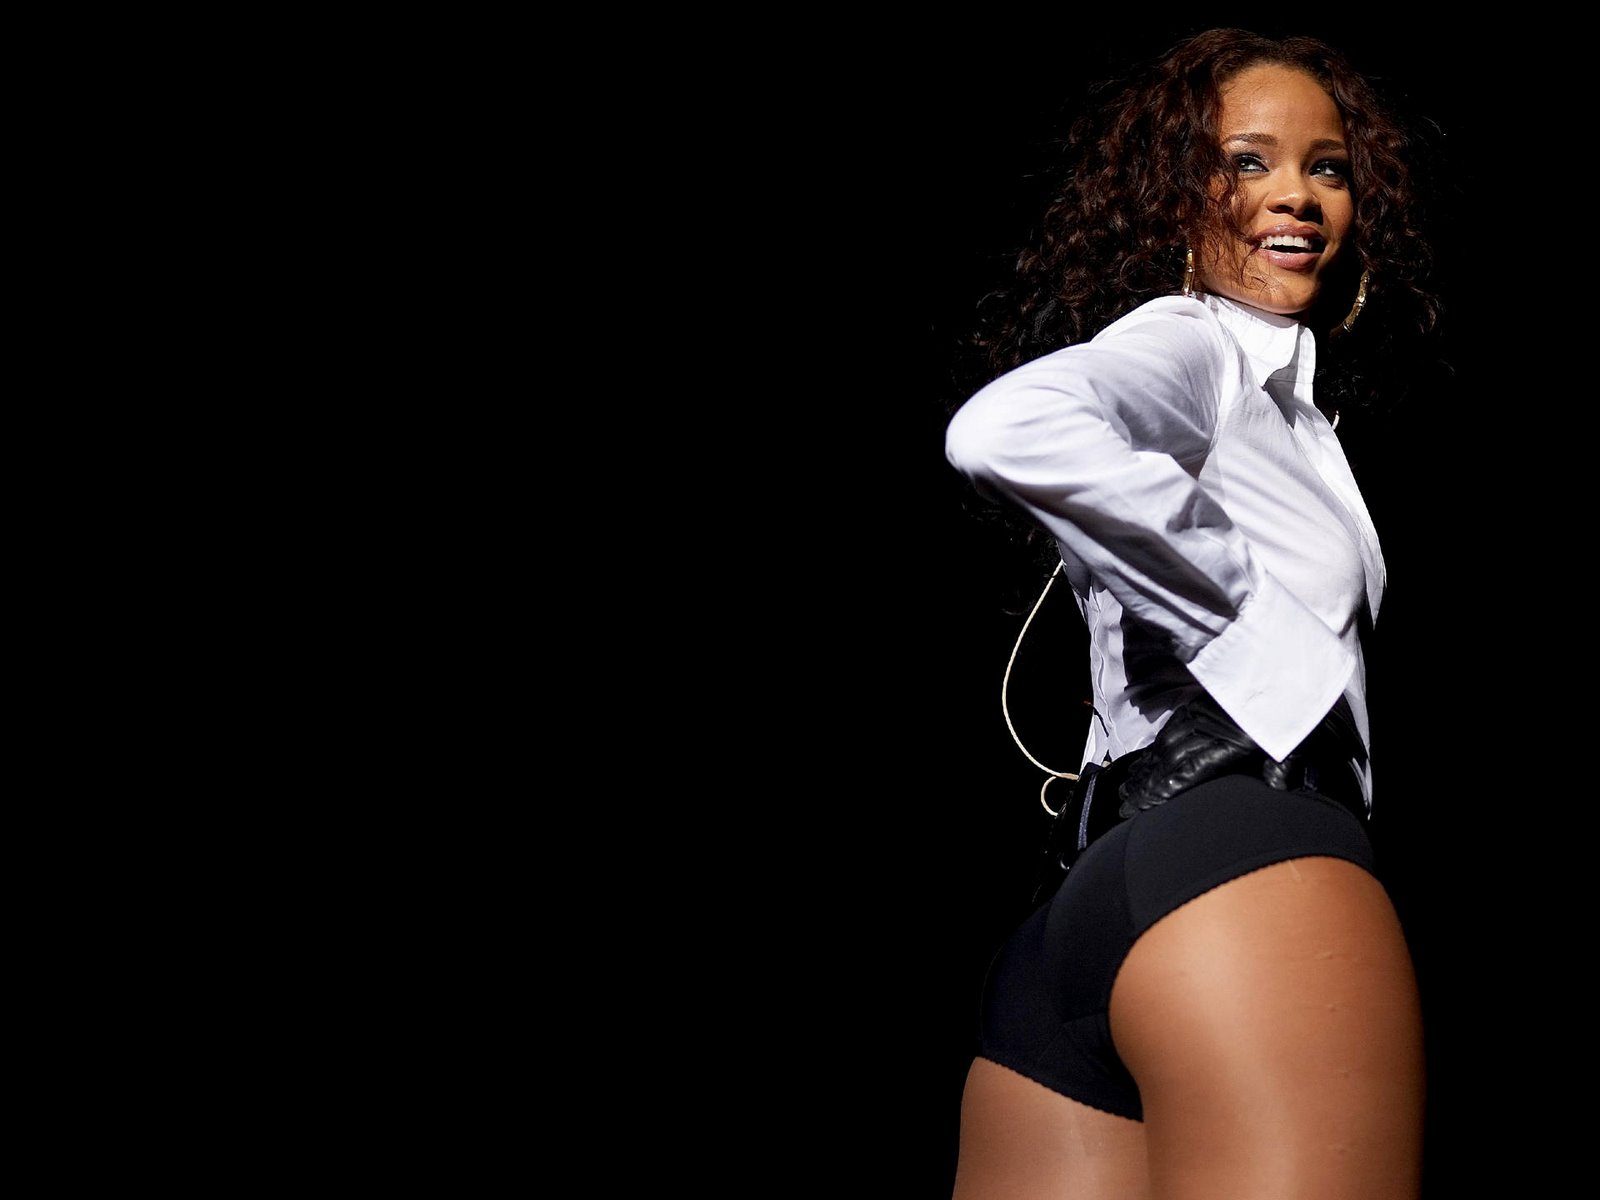 Rihanna Bikini Wallpapers Picture 4